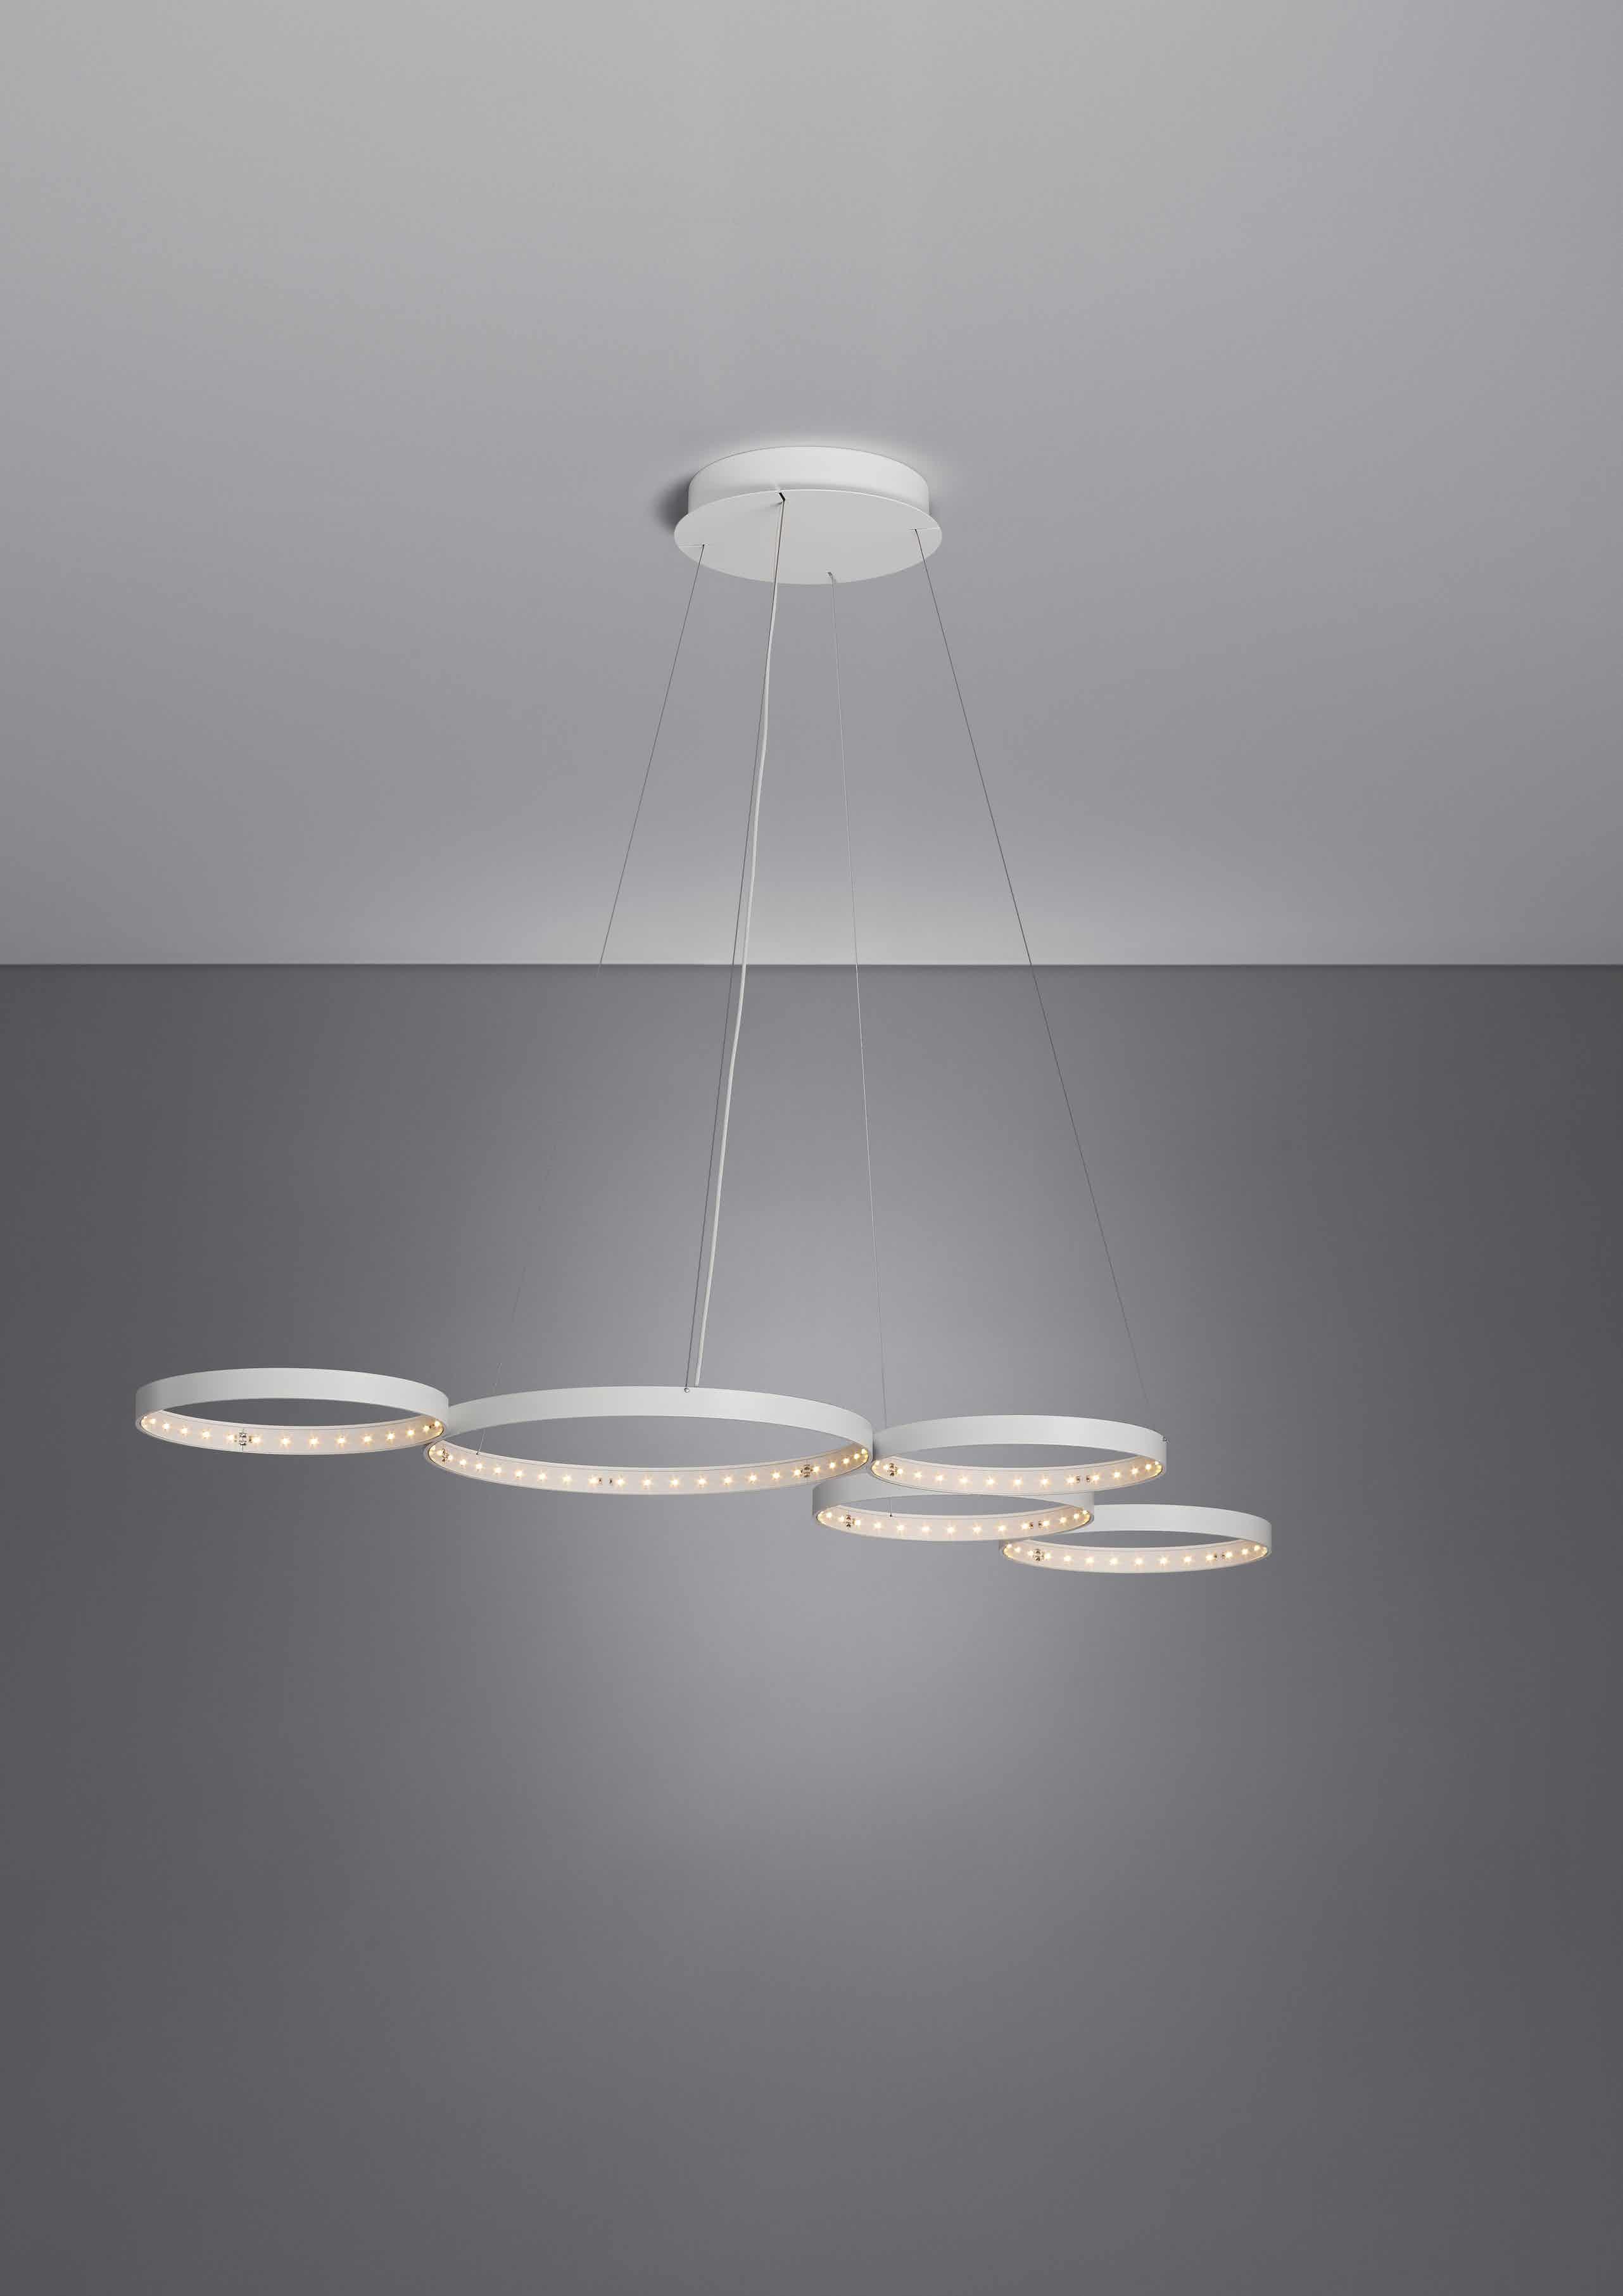 Le-deun-luminaires-super-8-hanging-lamp-white-position-4-haute-living